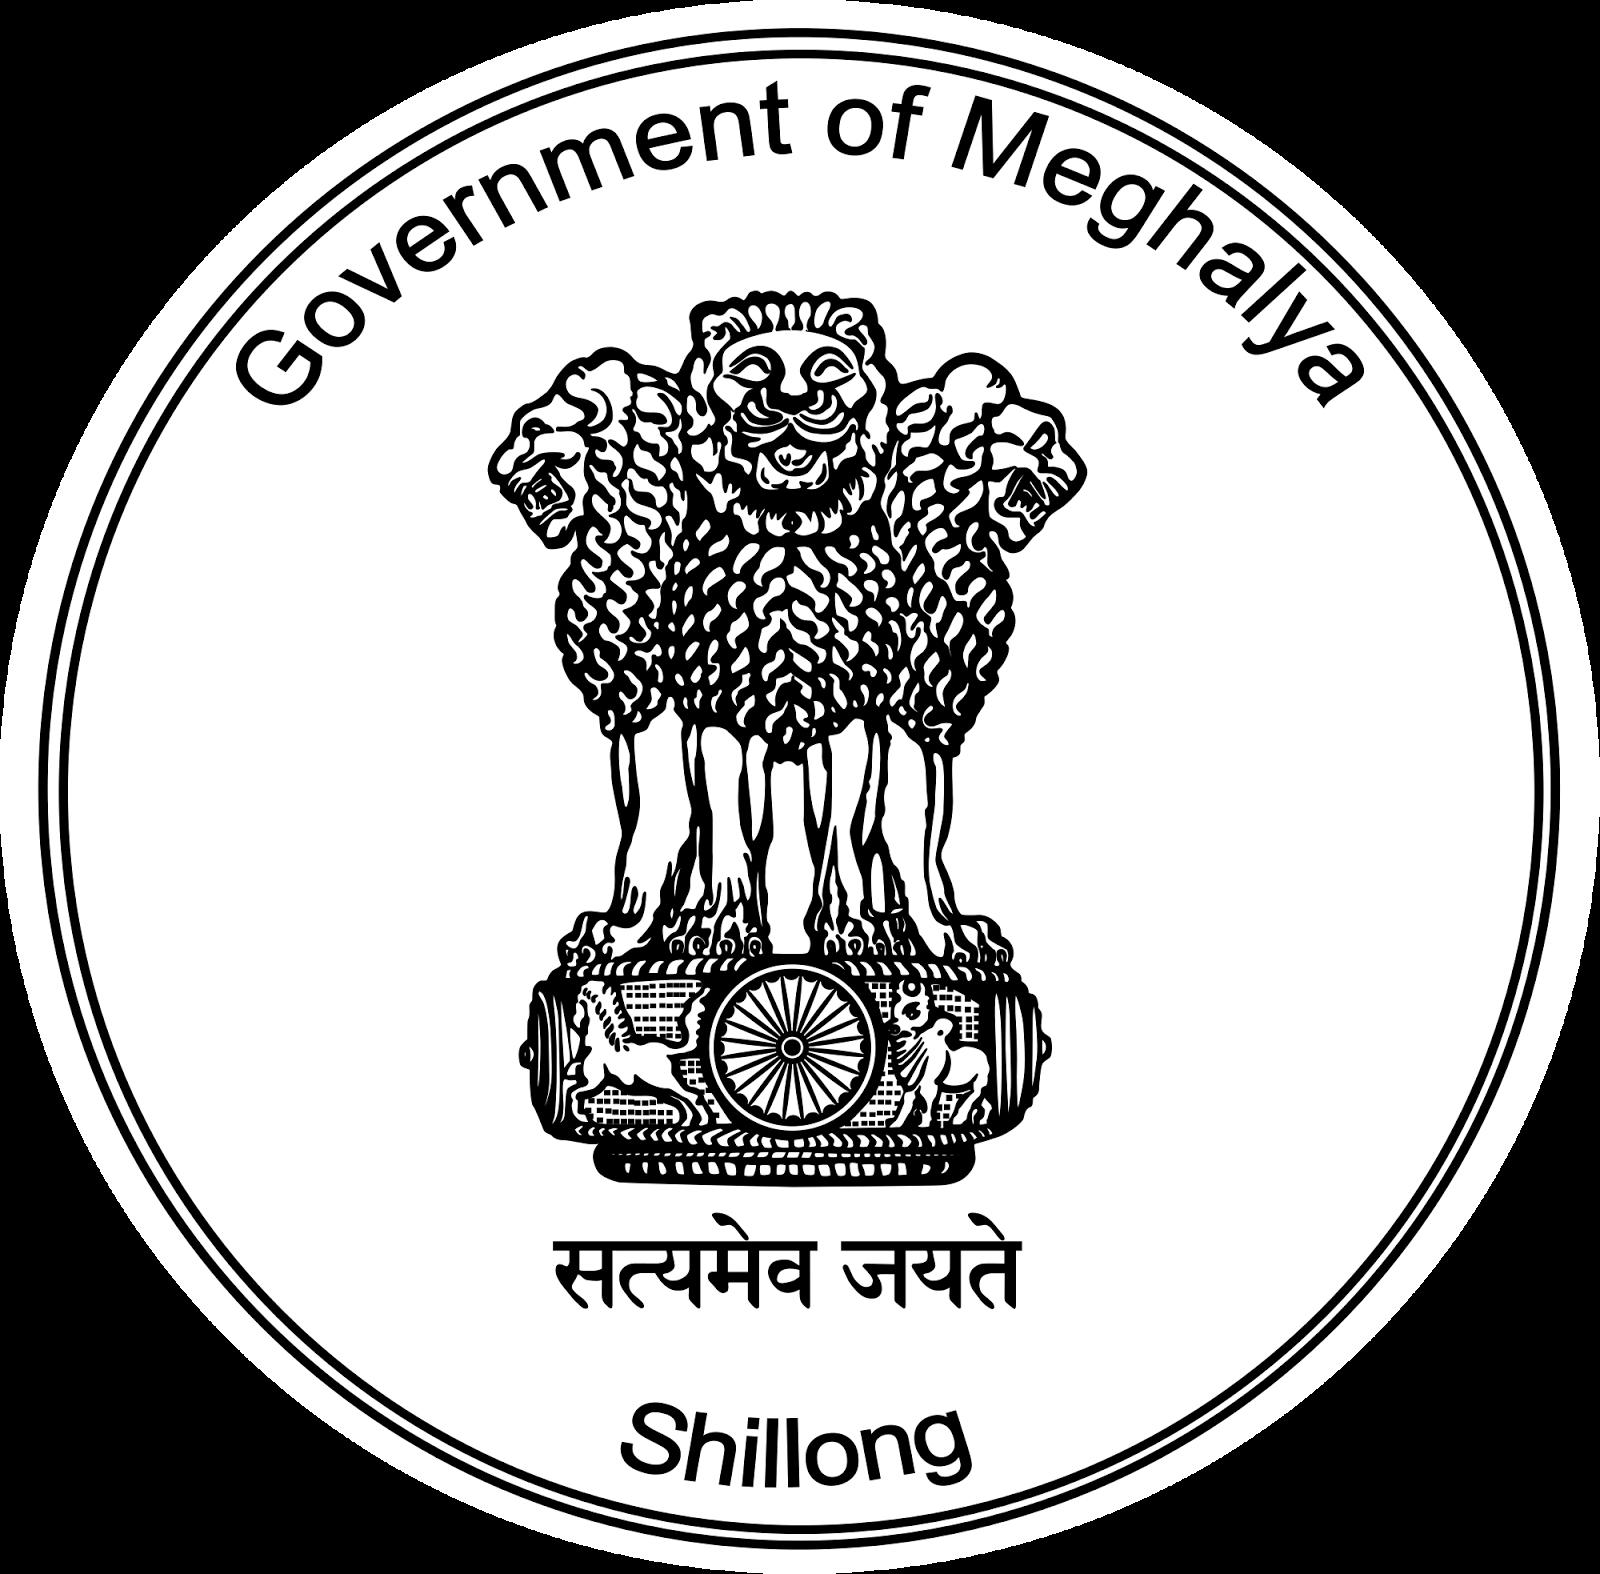 Meghalaya High Court Recruitment 2015-2016 Contingent